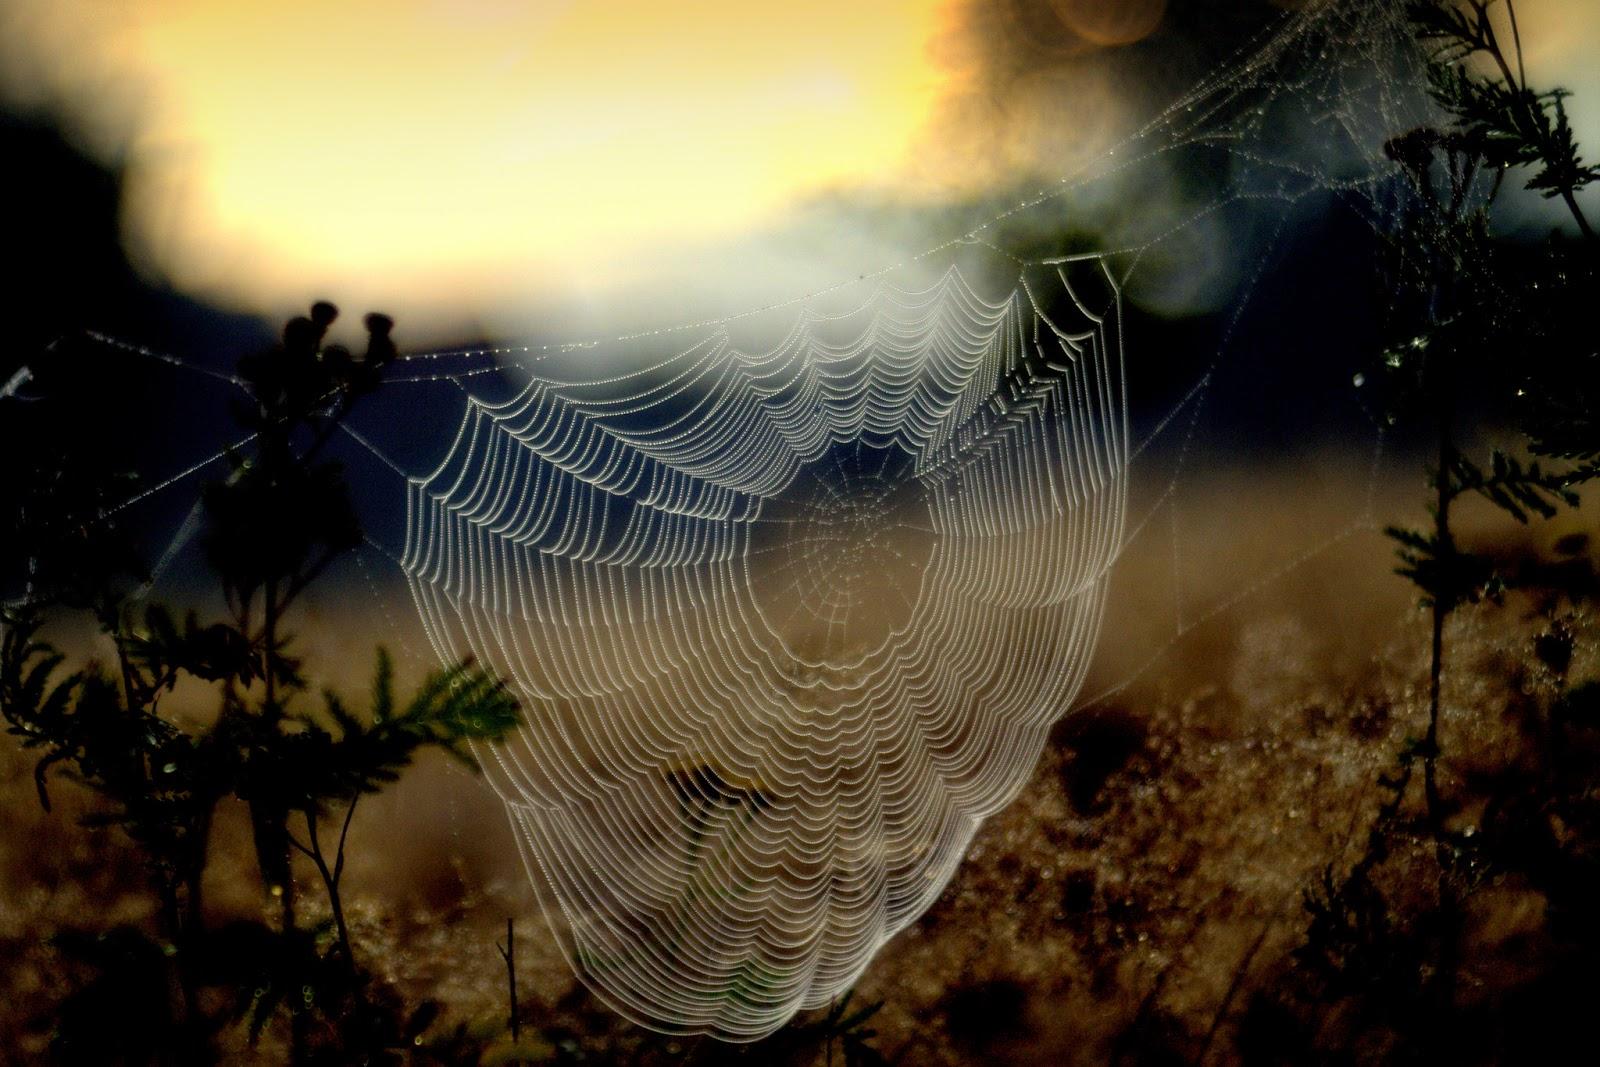 Beautiful And Amazing Photography Wallpaper DP Free ...